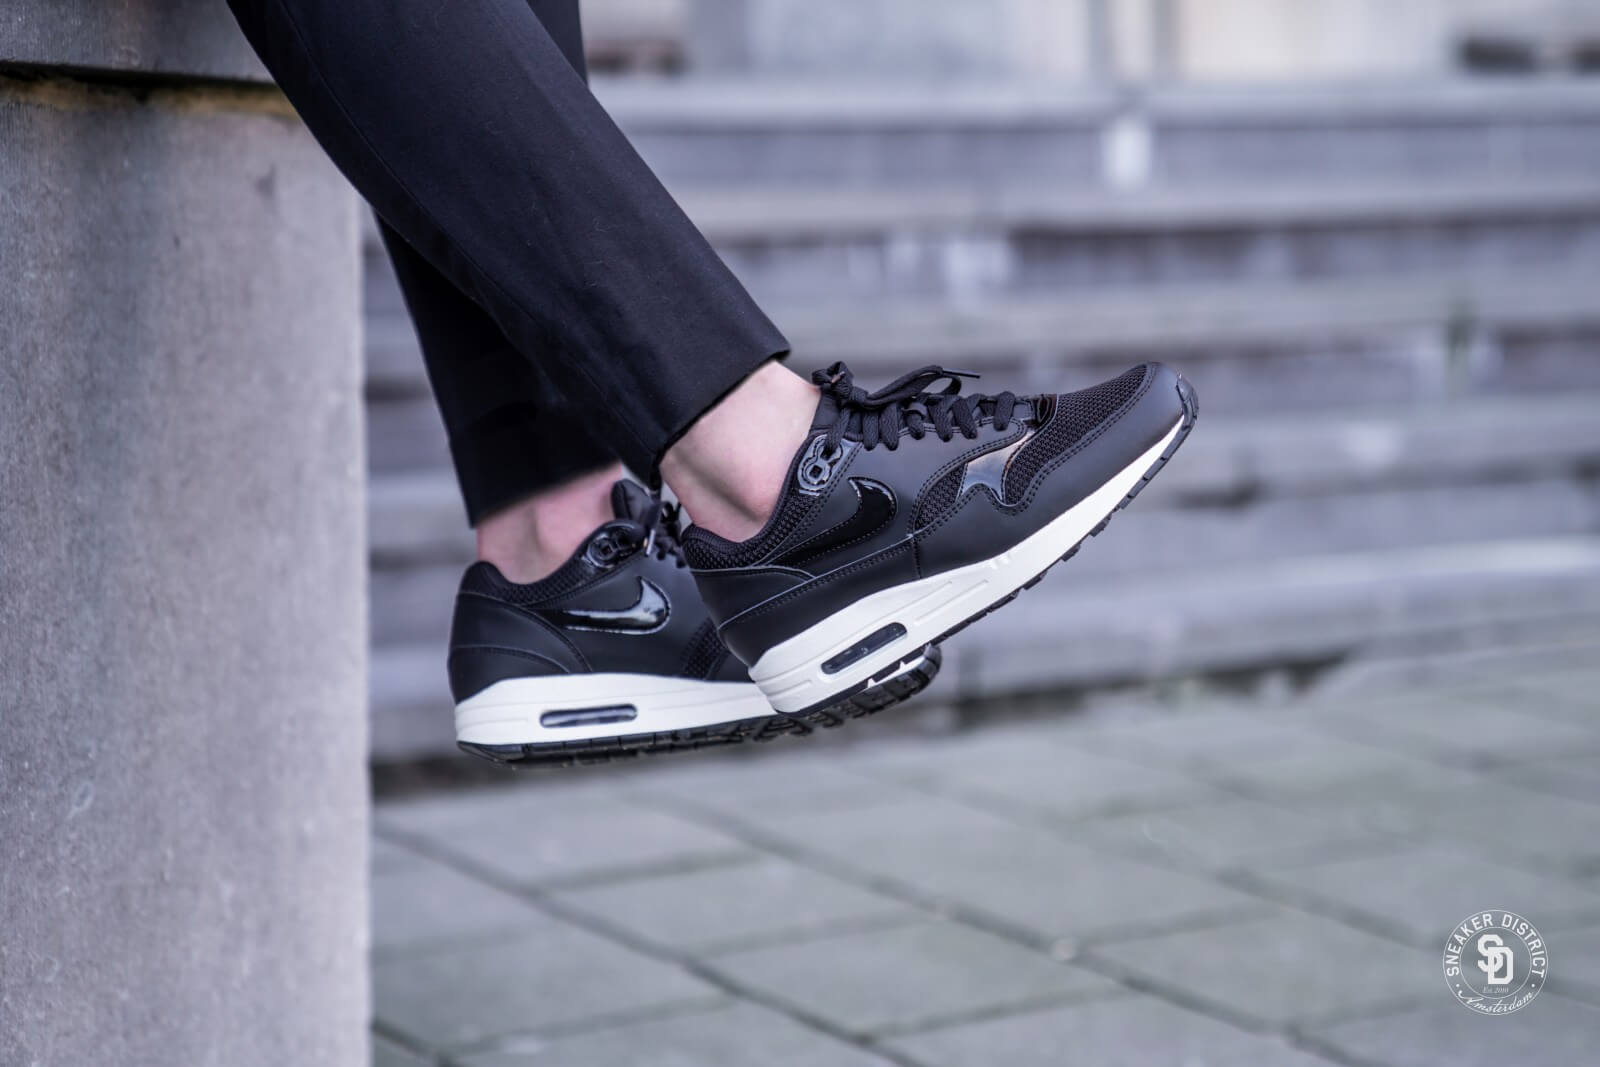 nett Nike Air Max 1 319986 039 Zwart 43 maat 43 billig